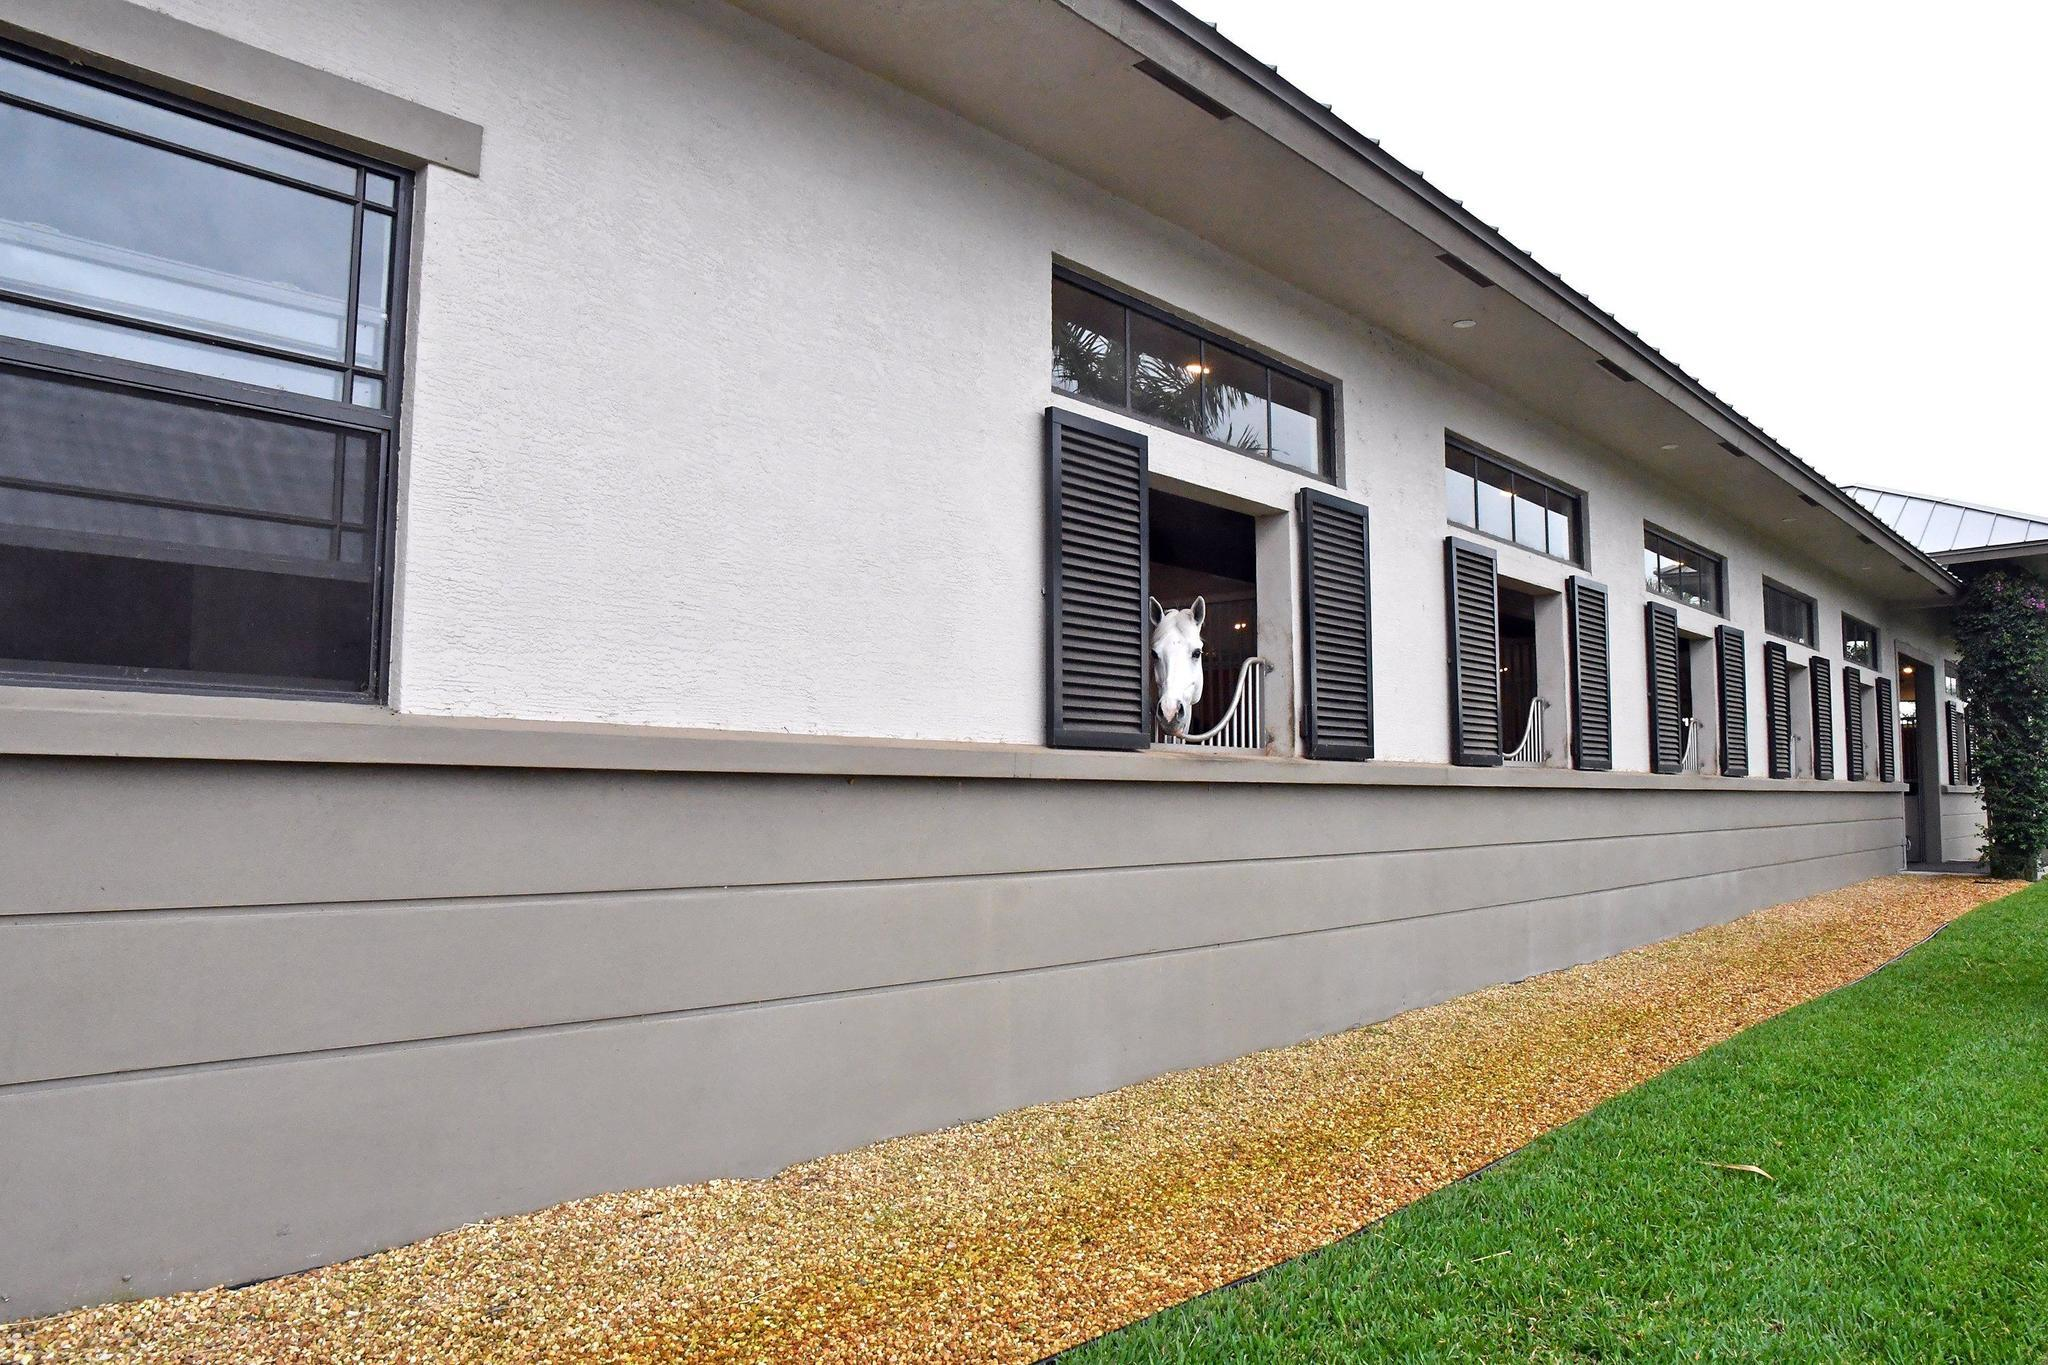 Peek Into Wellington S Luxurious Barns To Benefit Semper Fi Fund Photos South Florida Sun Sentinel South Florida Sun Sentinel